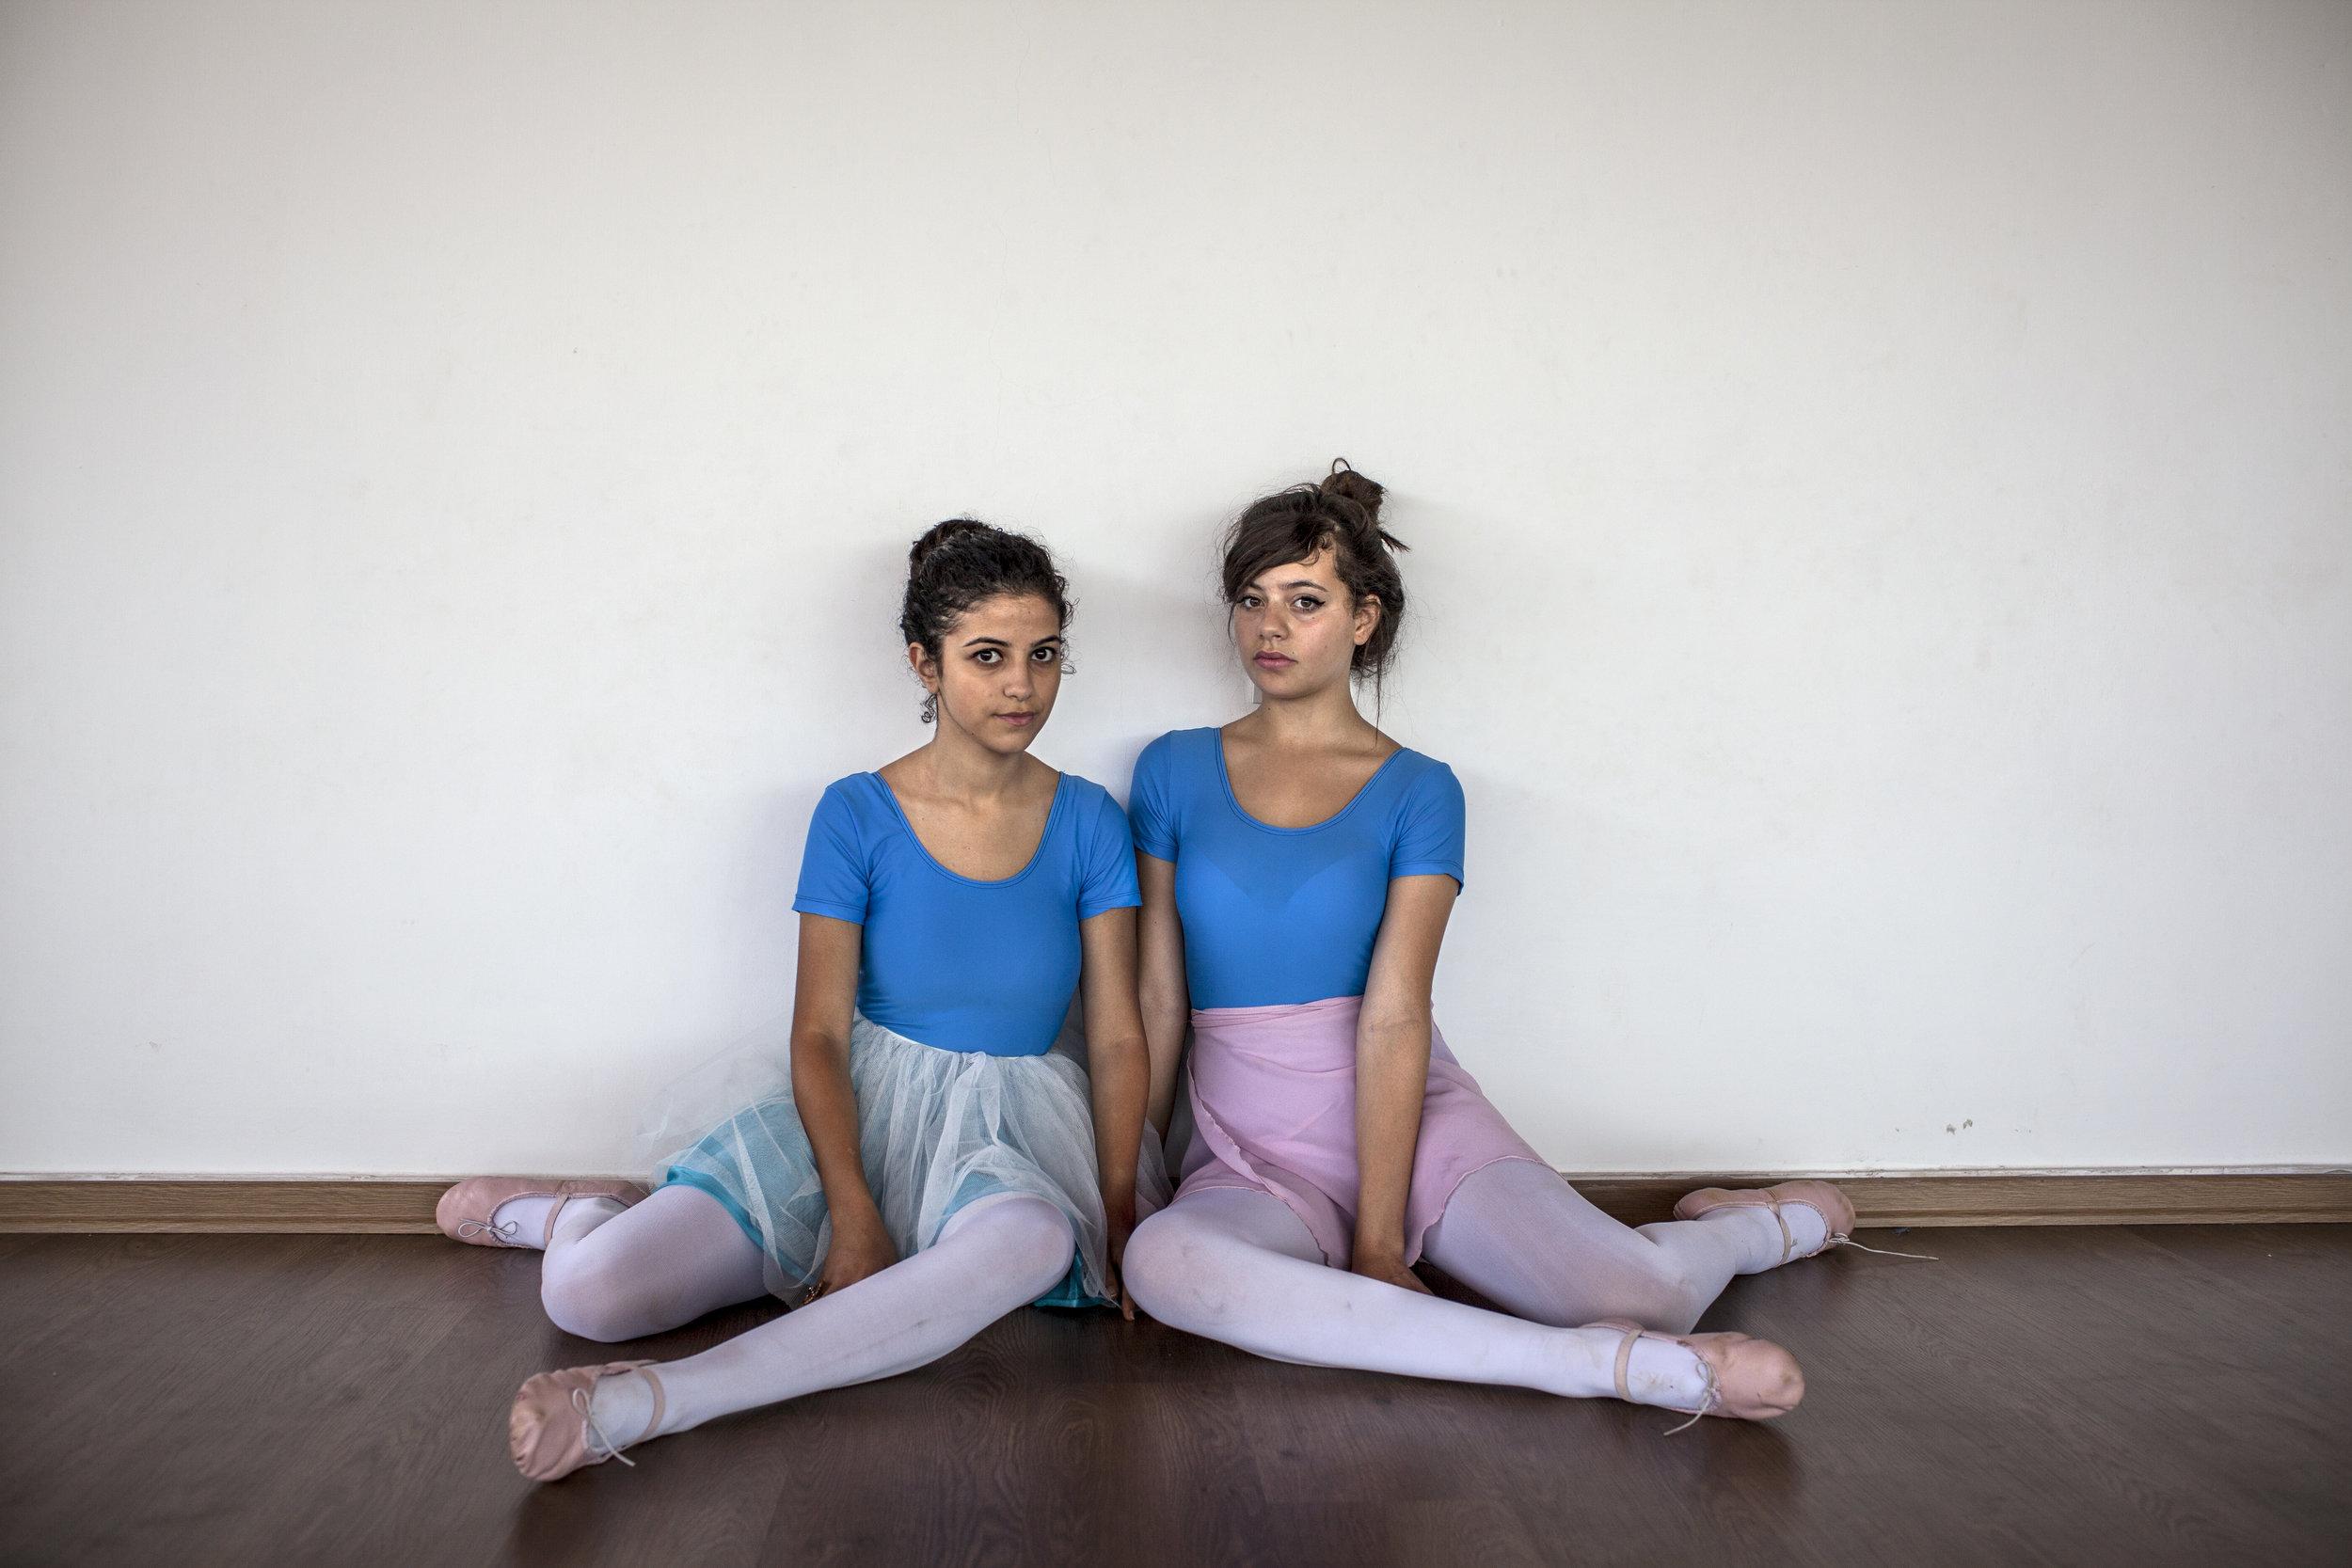 Tanya Habjouqa/NOOR RamallahTwo Ramallah high schoolers with big dreams take ballet together.